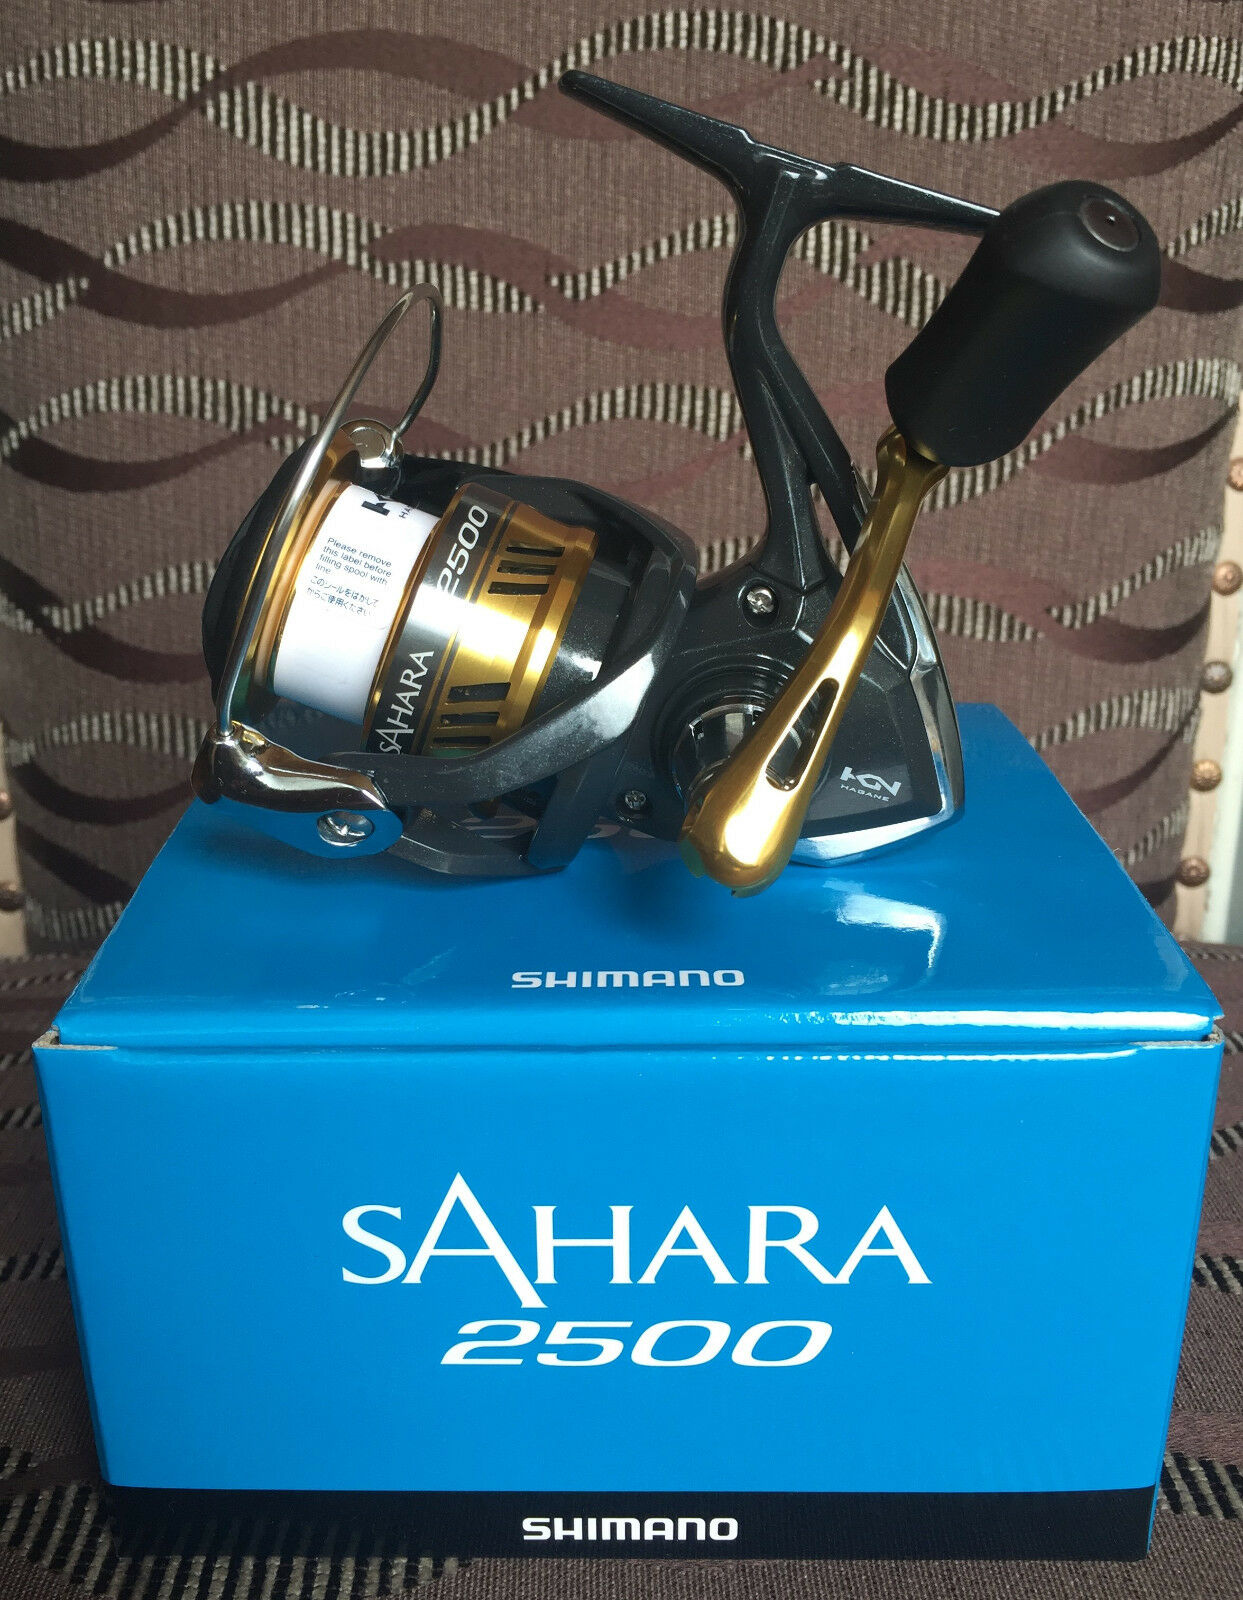 Shimano Sahara 2500 fi spinnrolle